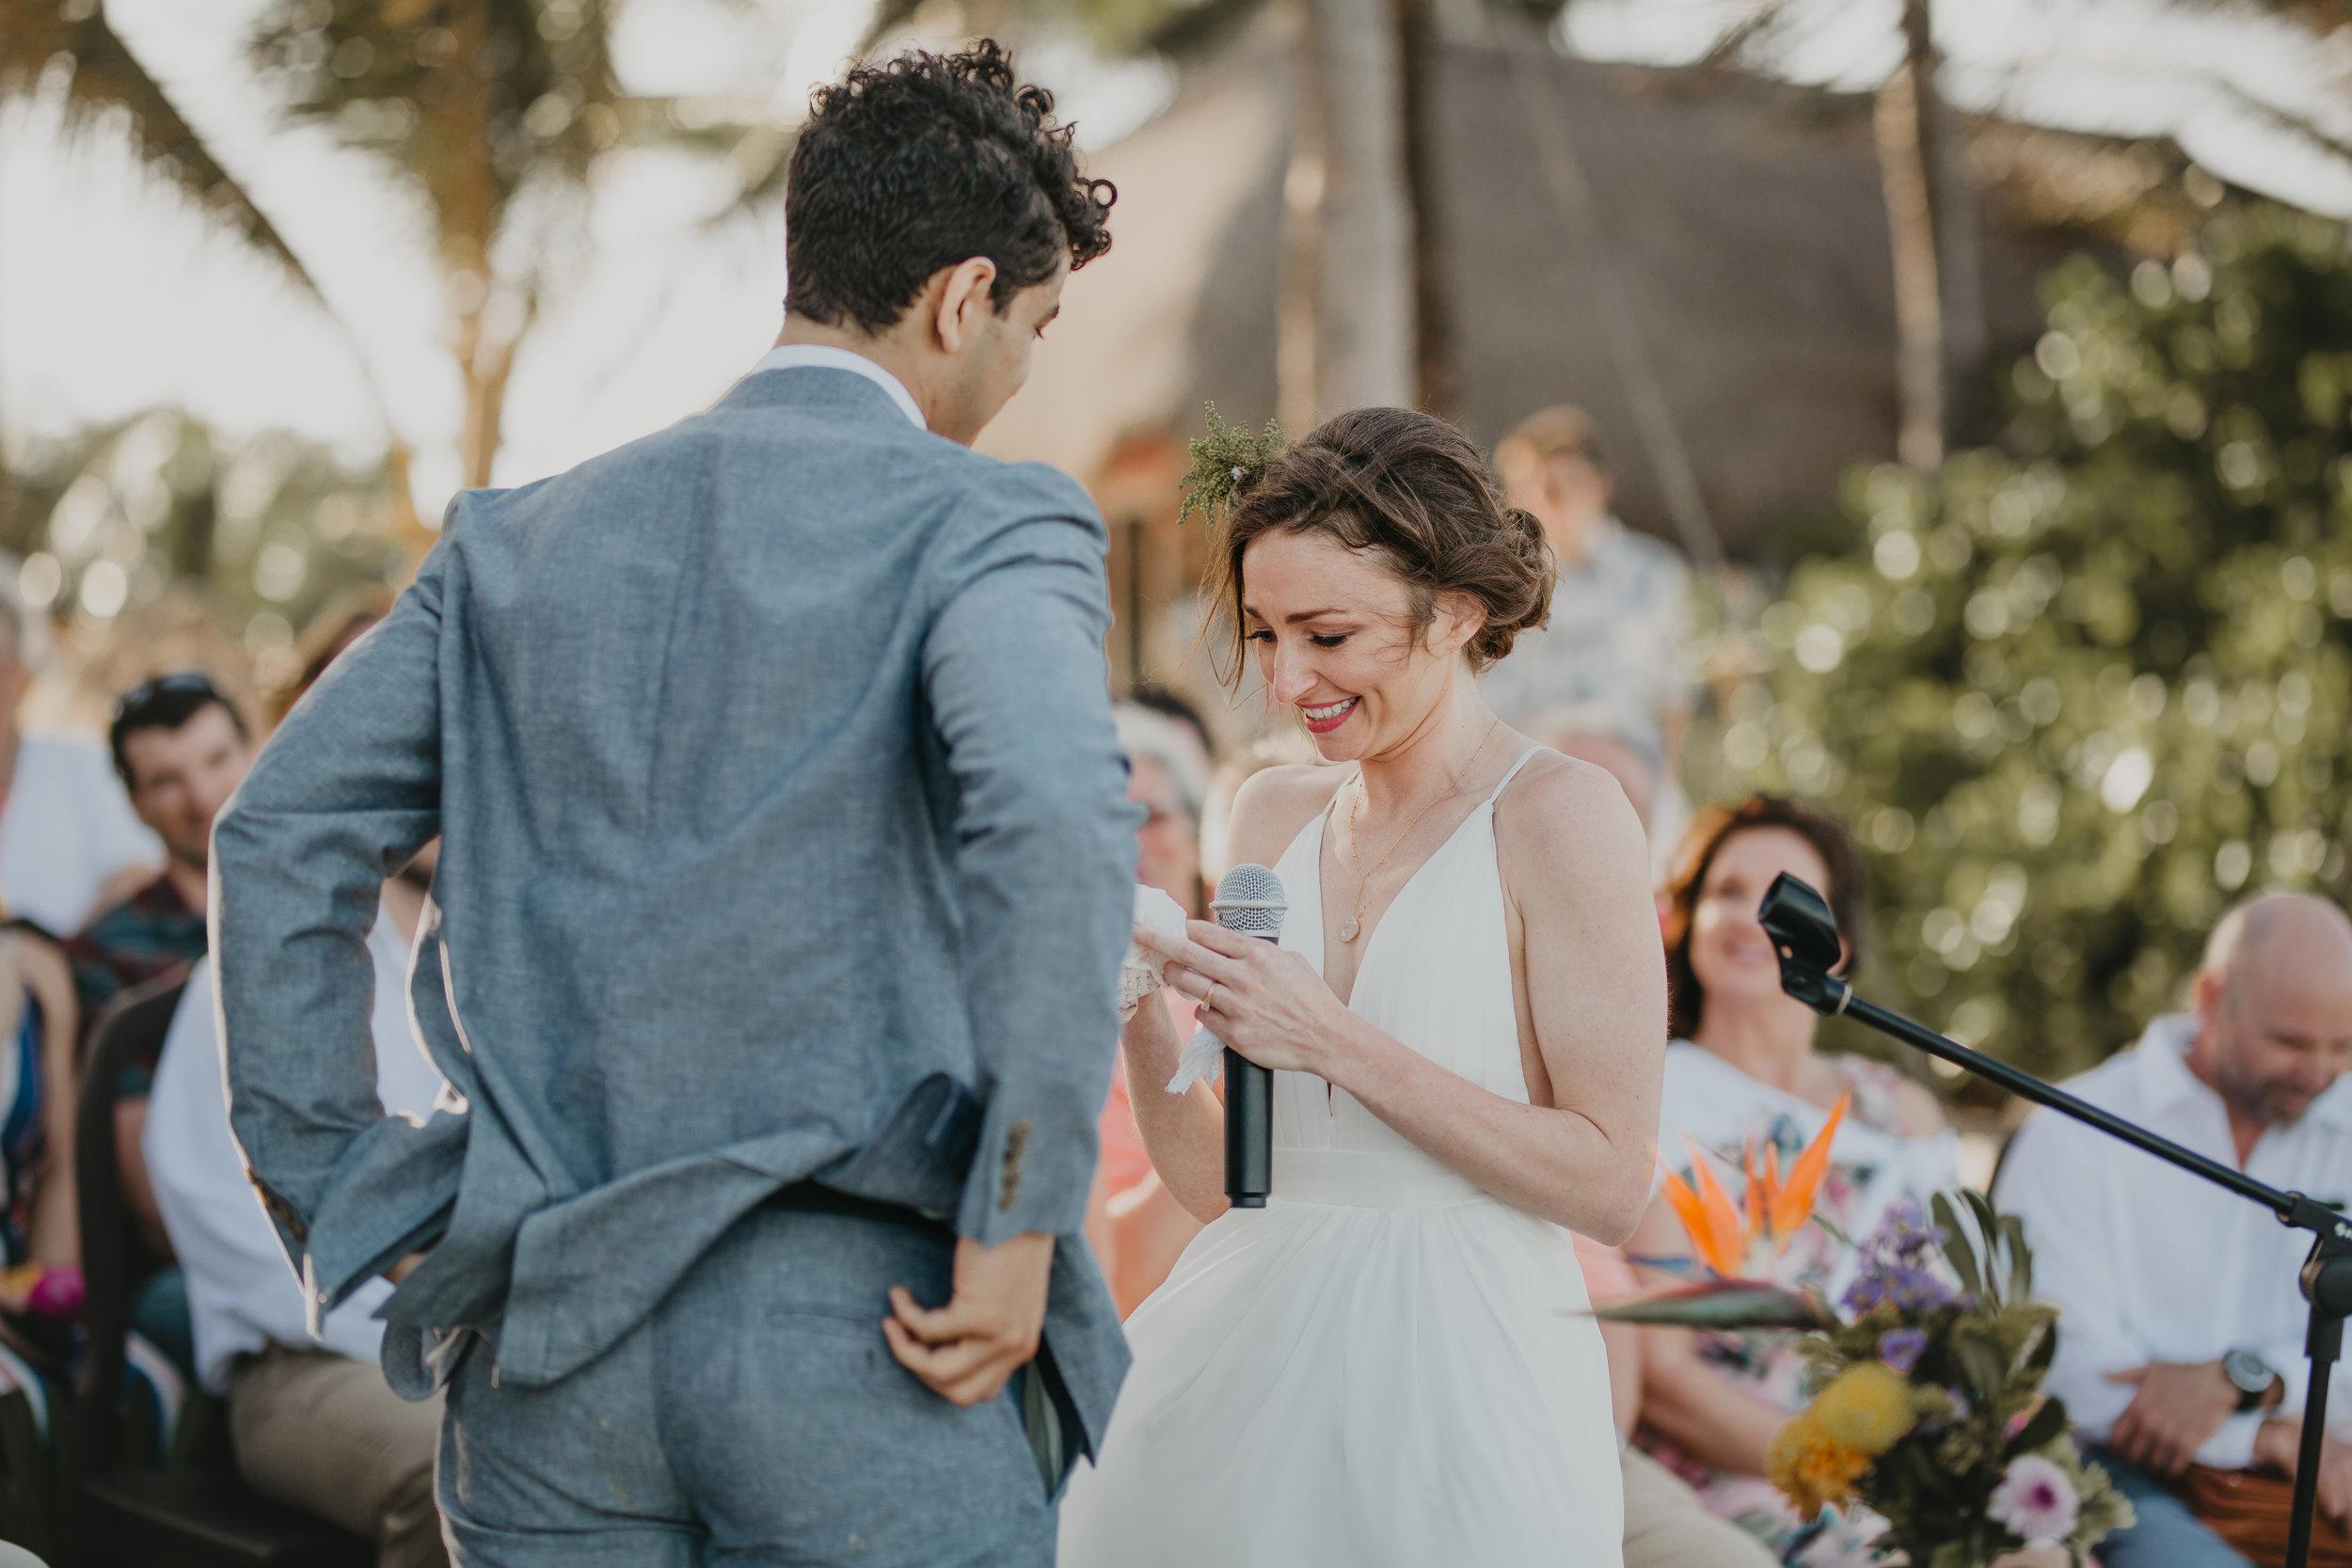 Nicole-Daacke-Photography-beachfront-akumal-destionation-wedding-tulum-mexico-elopement-photographer-destination-wedding-inspiration-sunset-champagne-pop-boho-bride-ocean-tropical-bohemian-tulum-wedding-photos-164.jpg